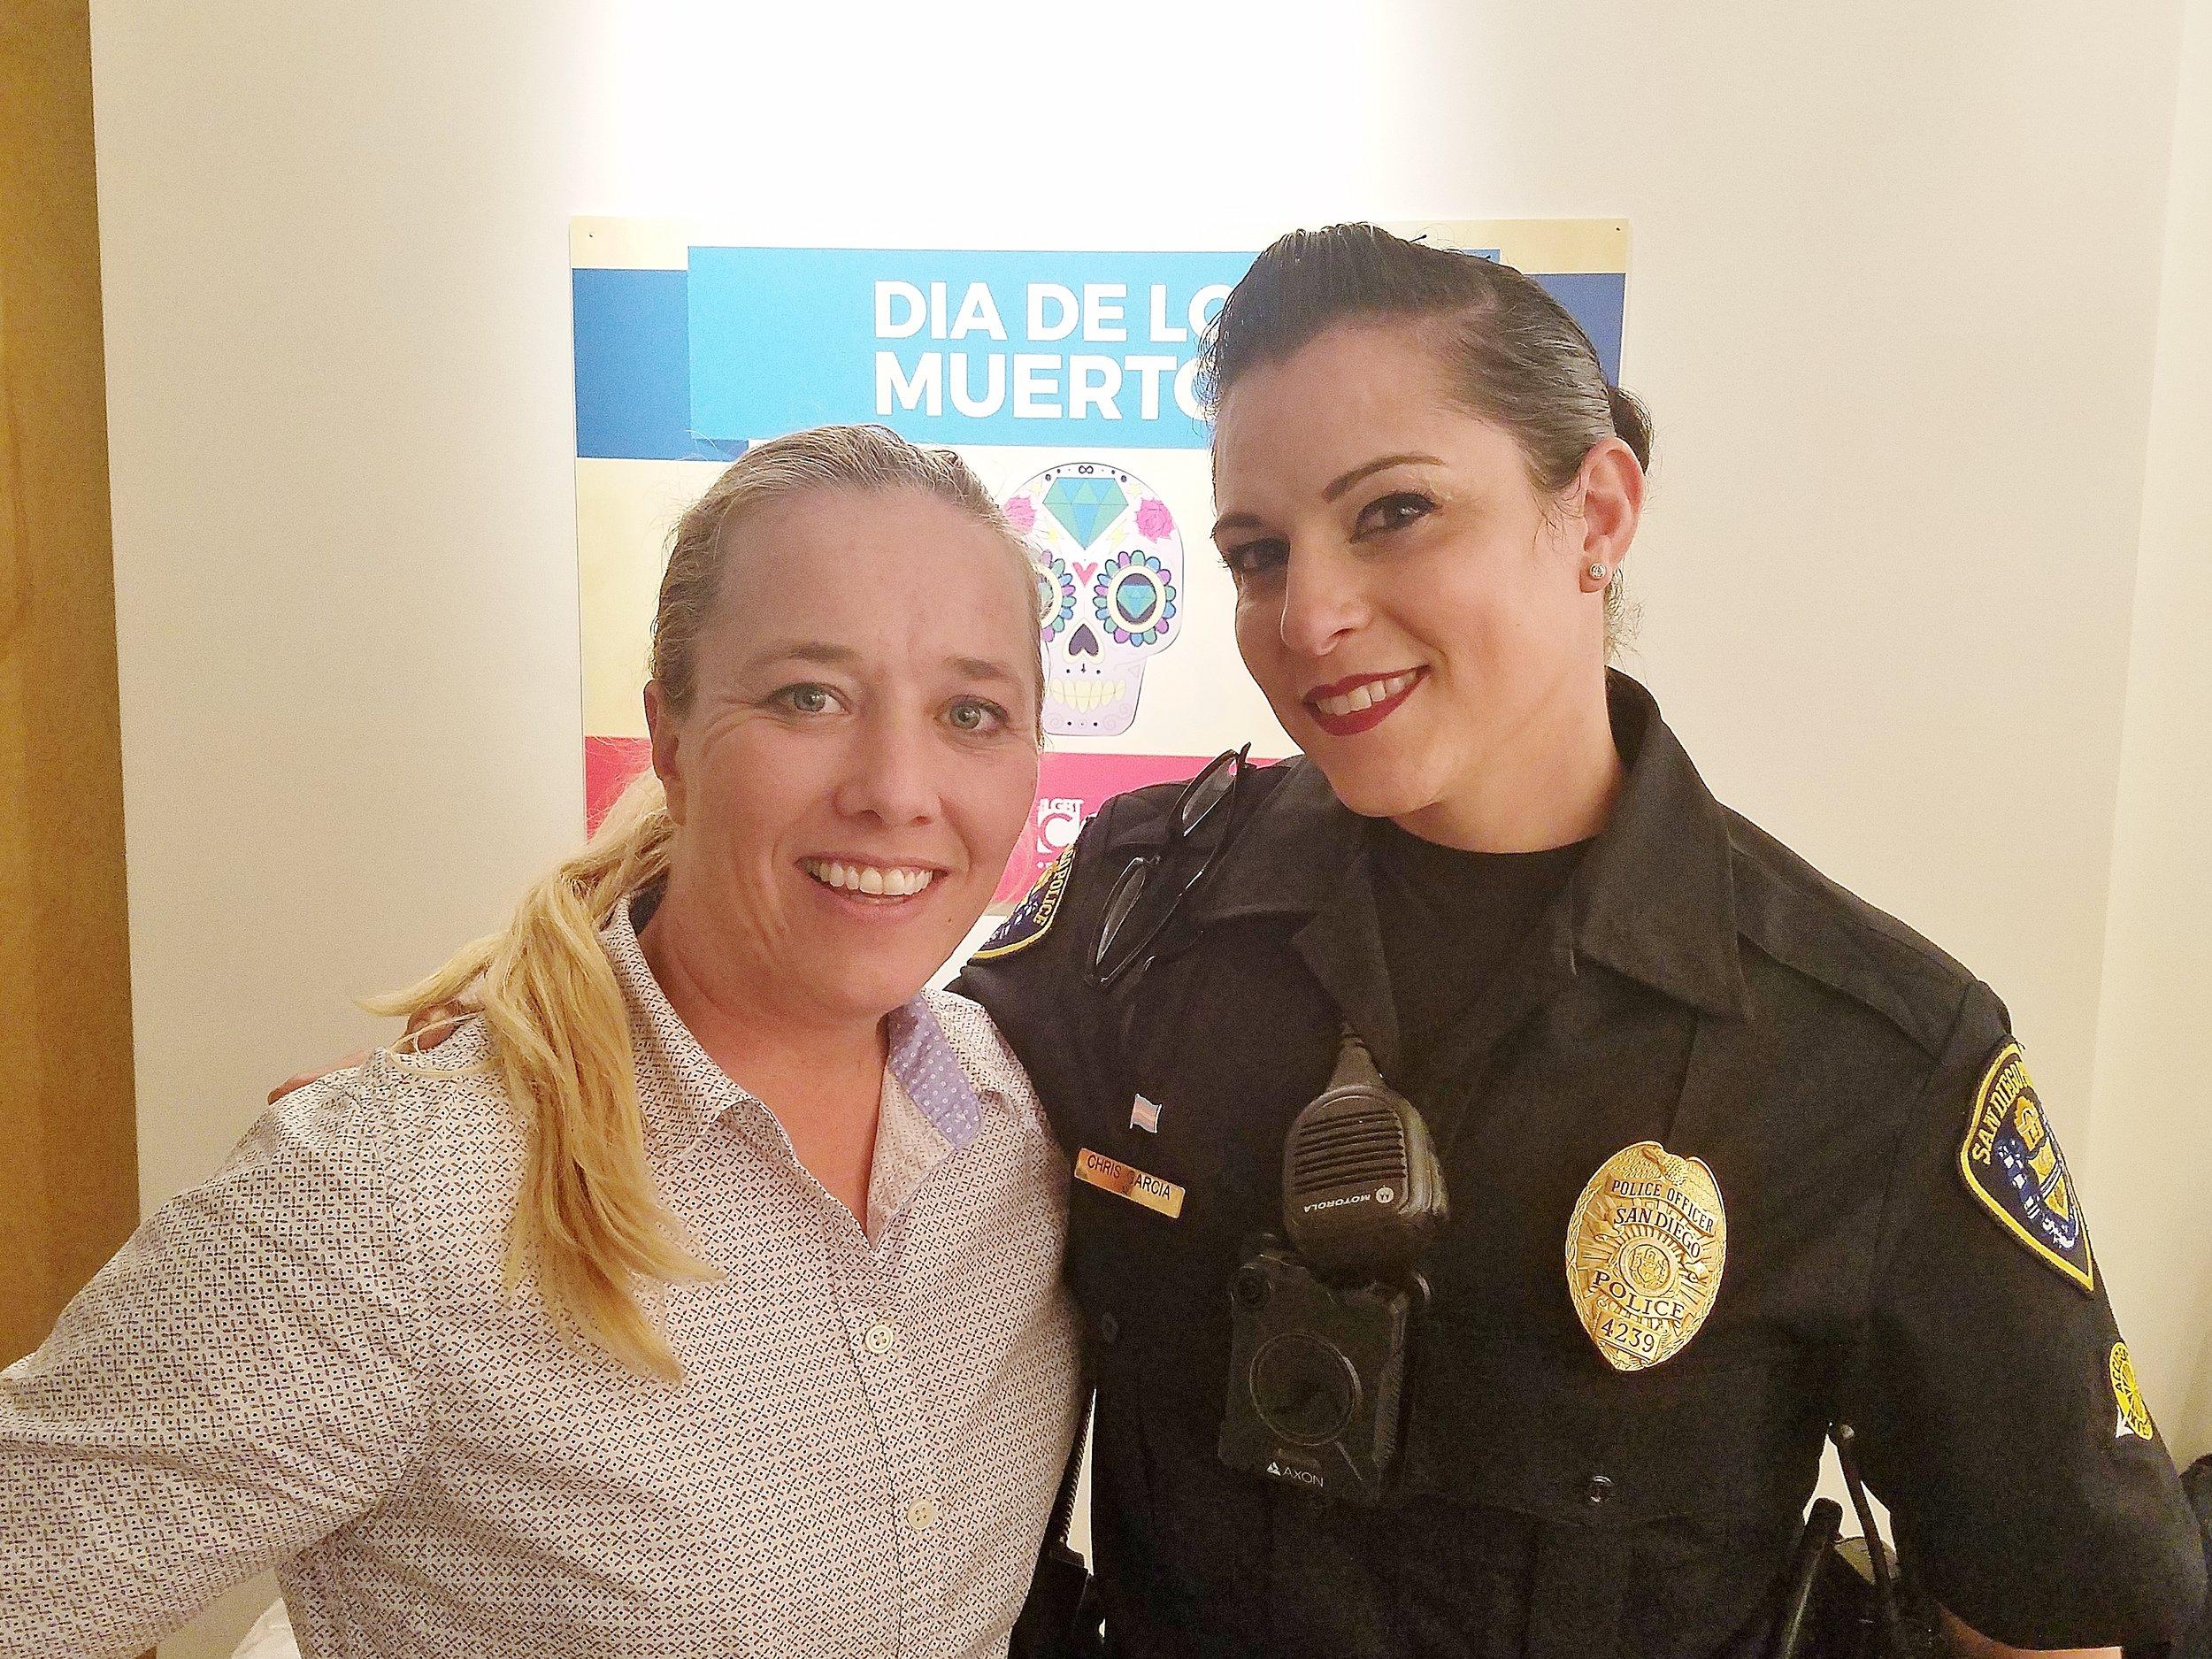 Officer Chris Garcia Marlene Klarborg Larsen Therapy 4 LGBT.jpg